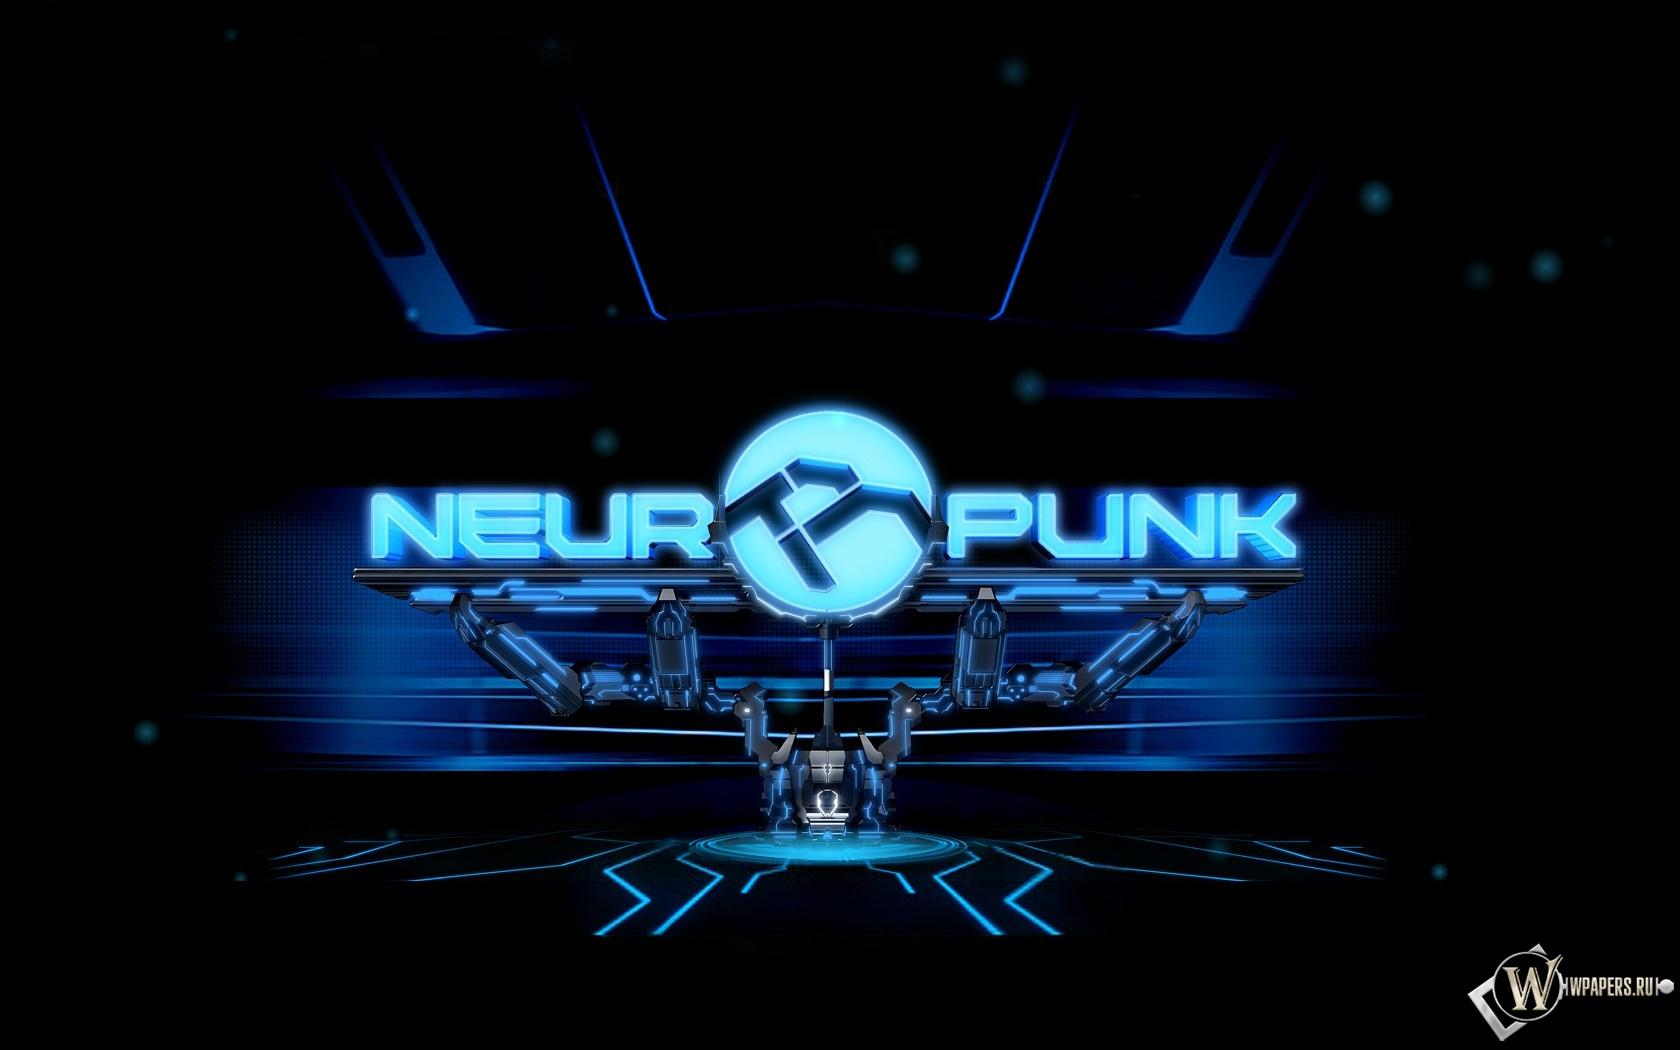 Neuropunk 1680x1050